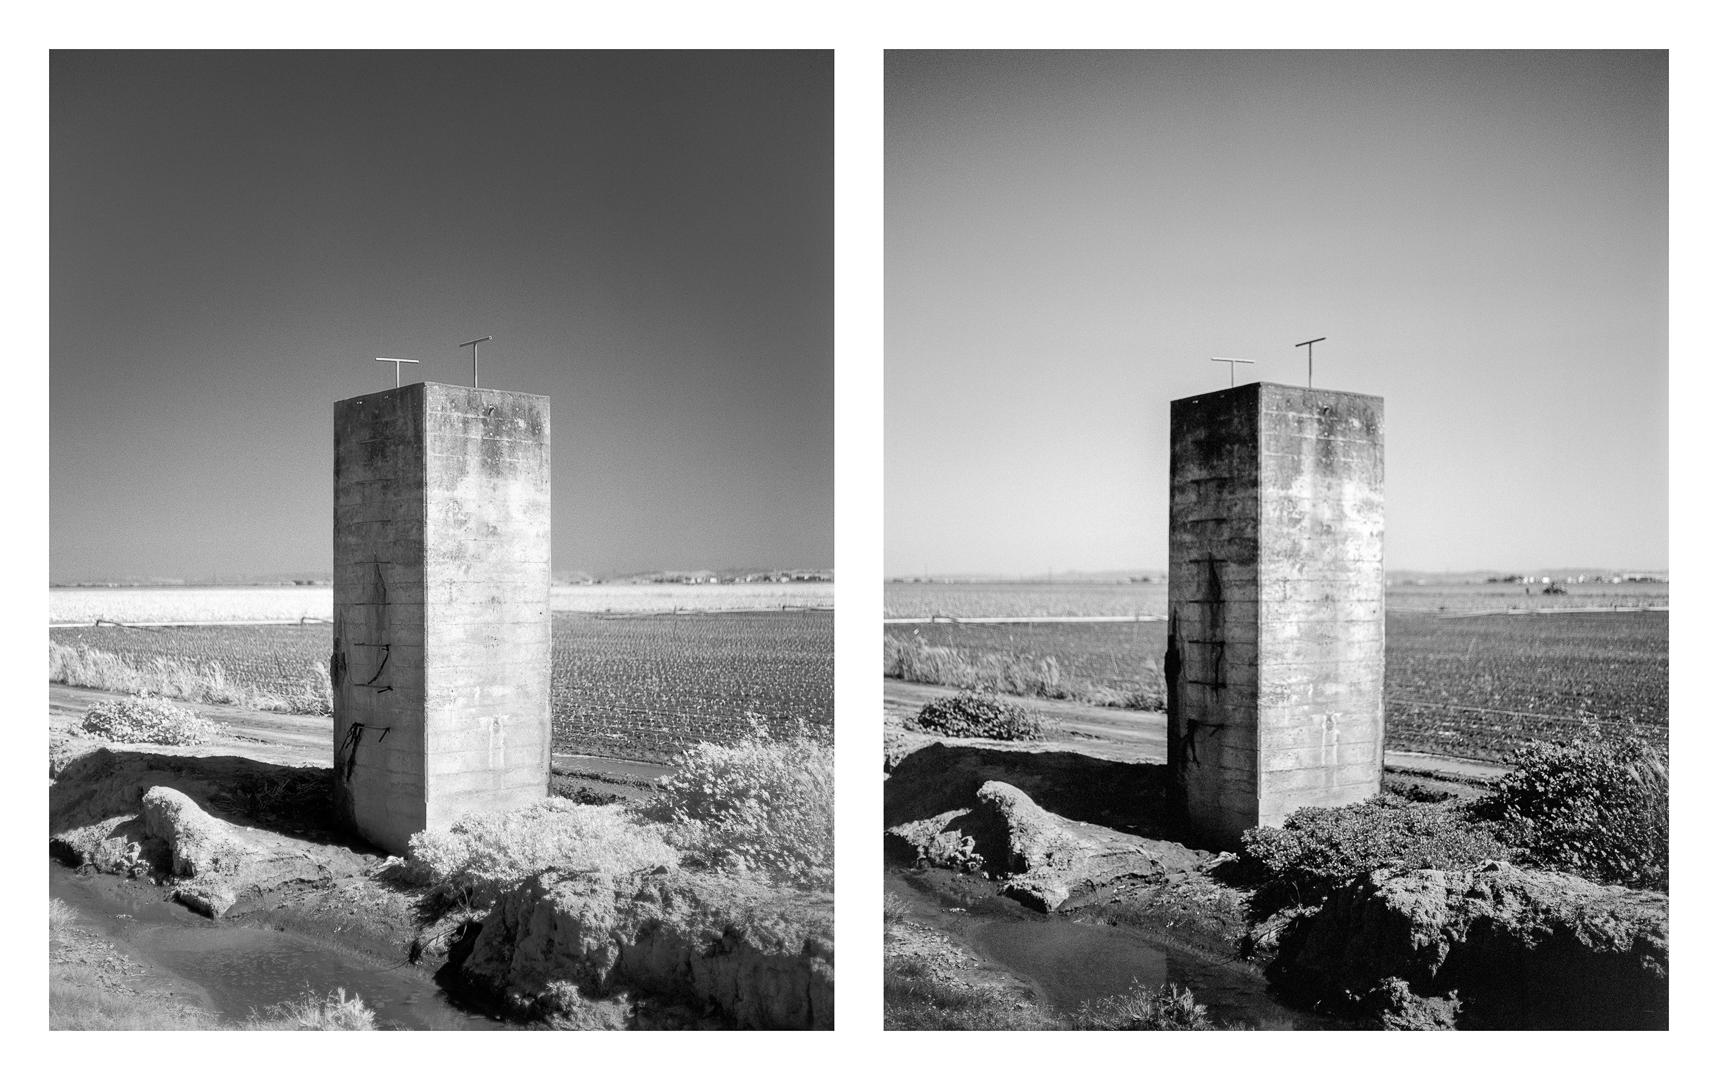 Monolith diptych kz6vlq